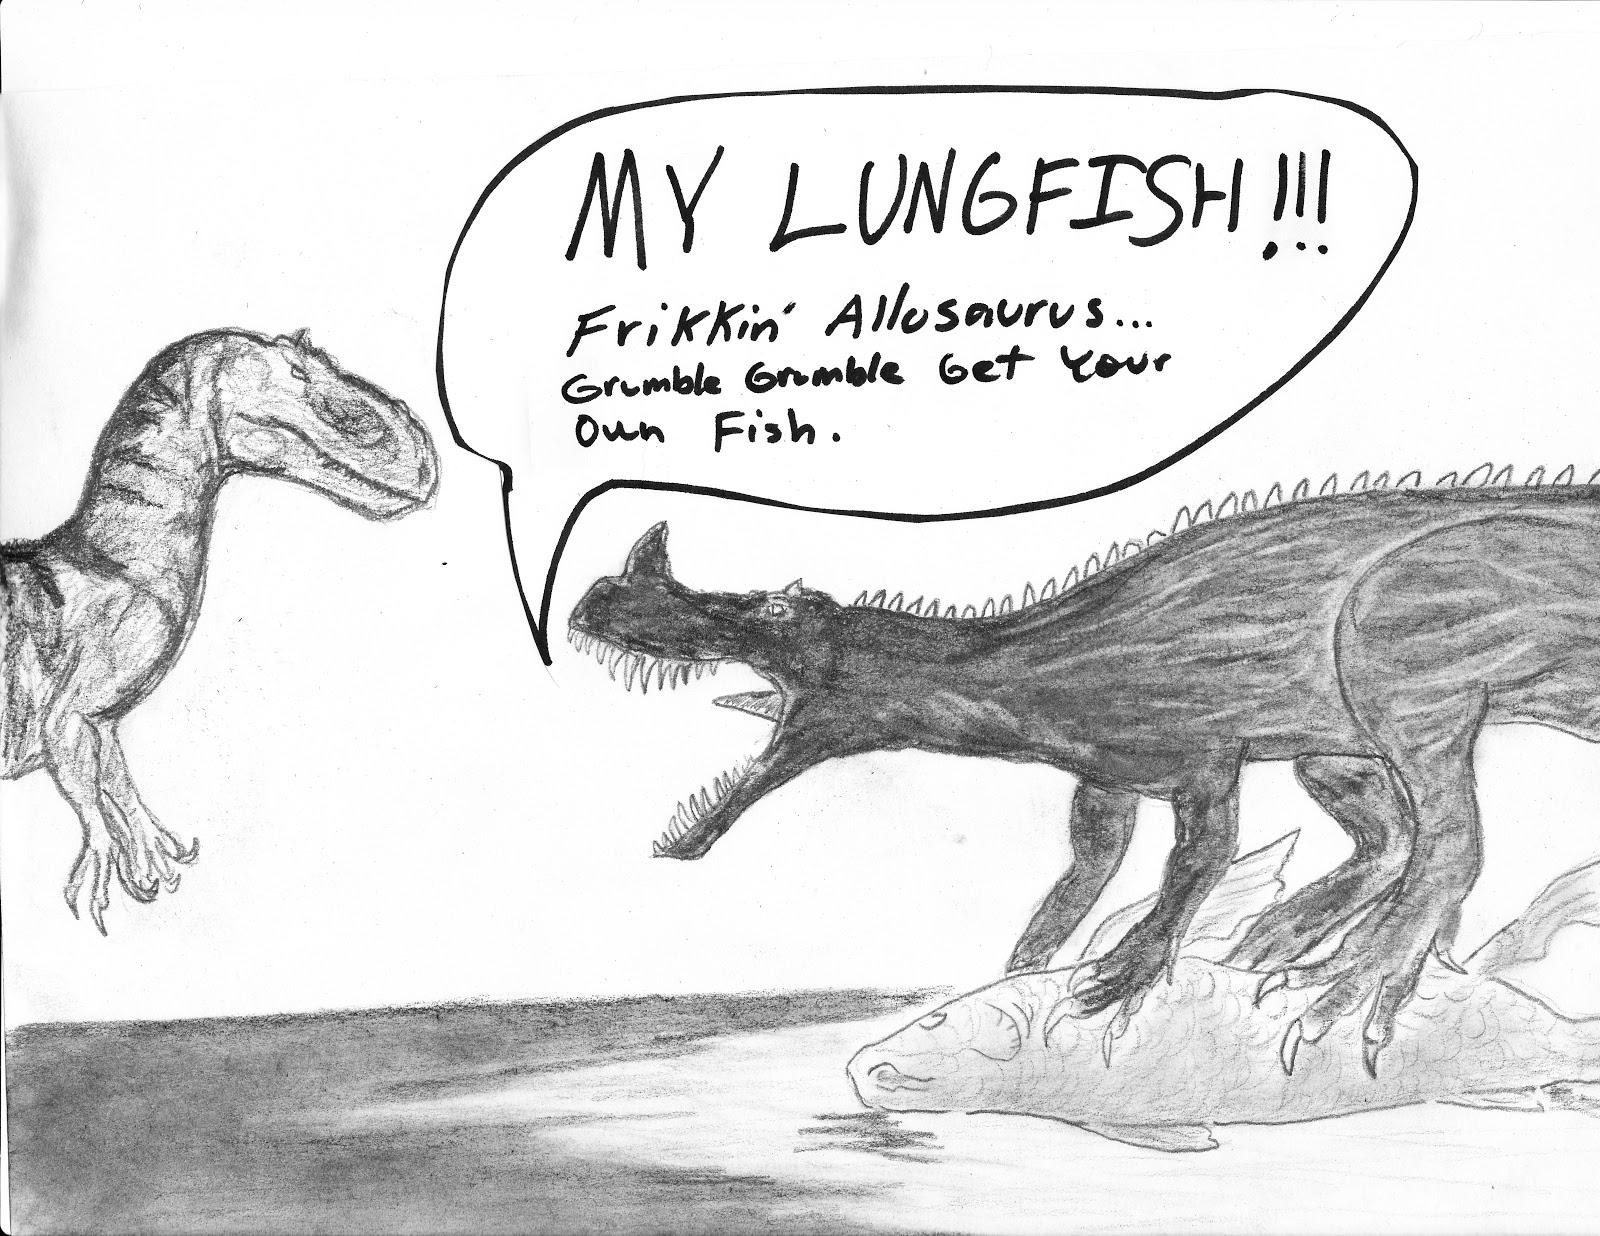 Juvenile Allosaurus an...